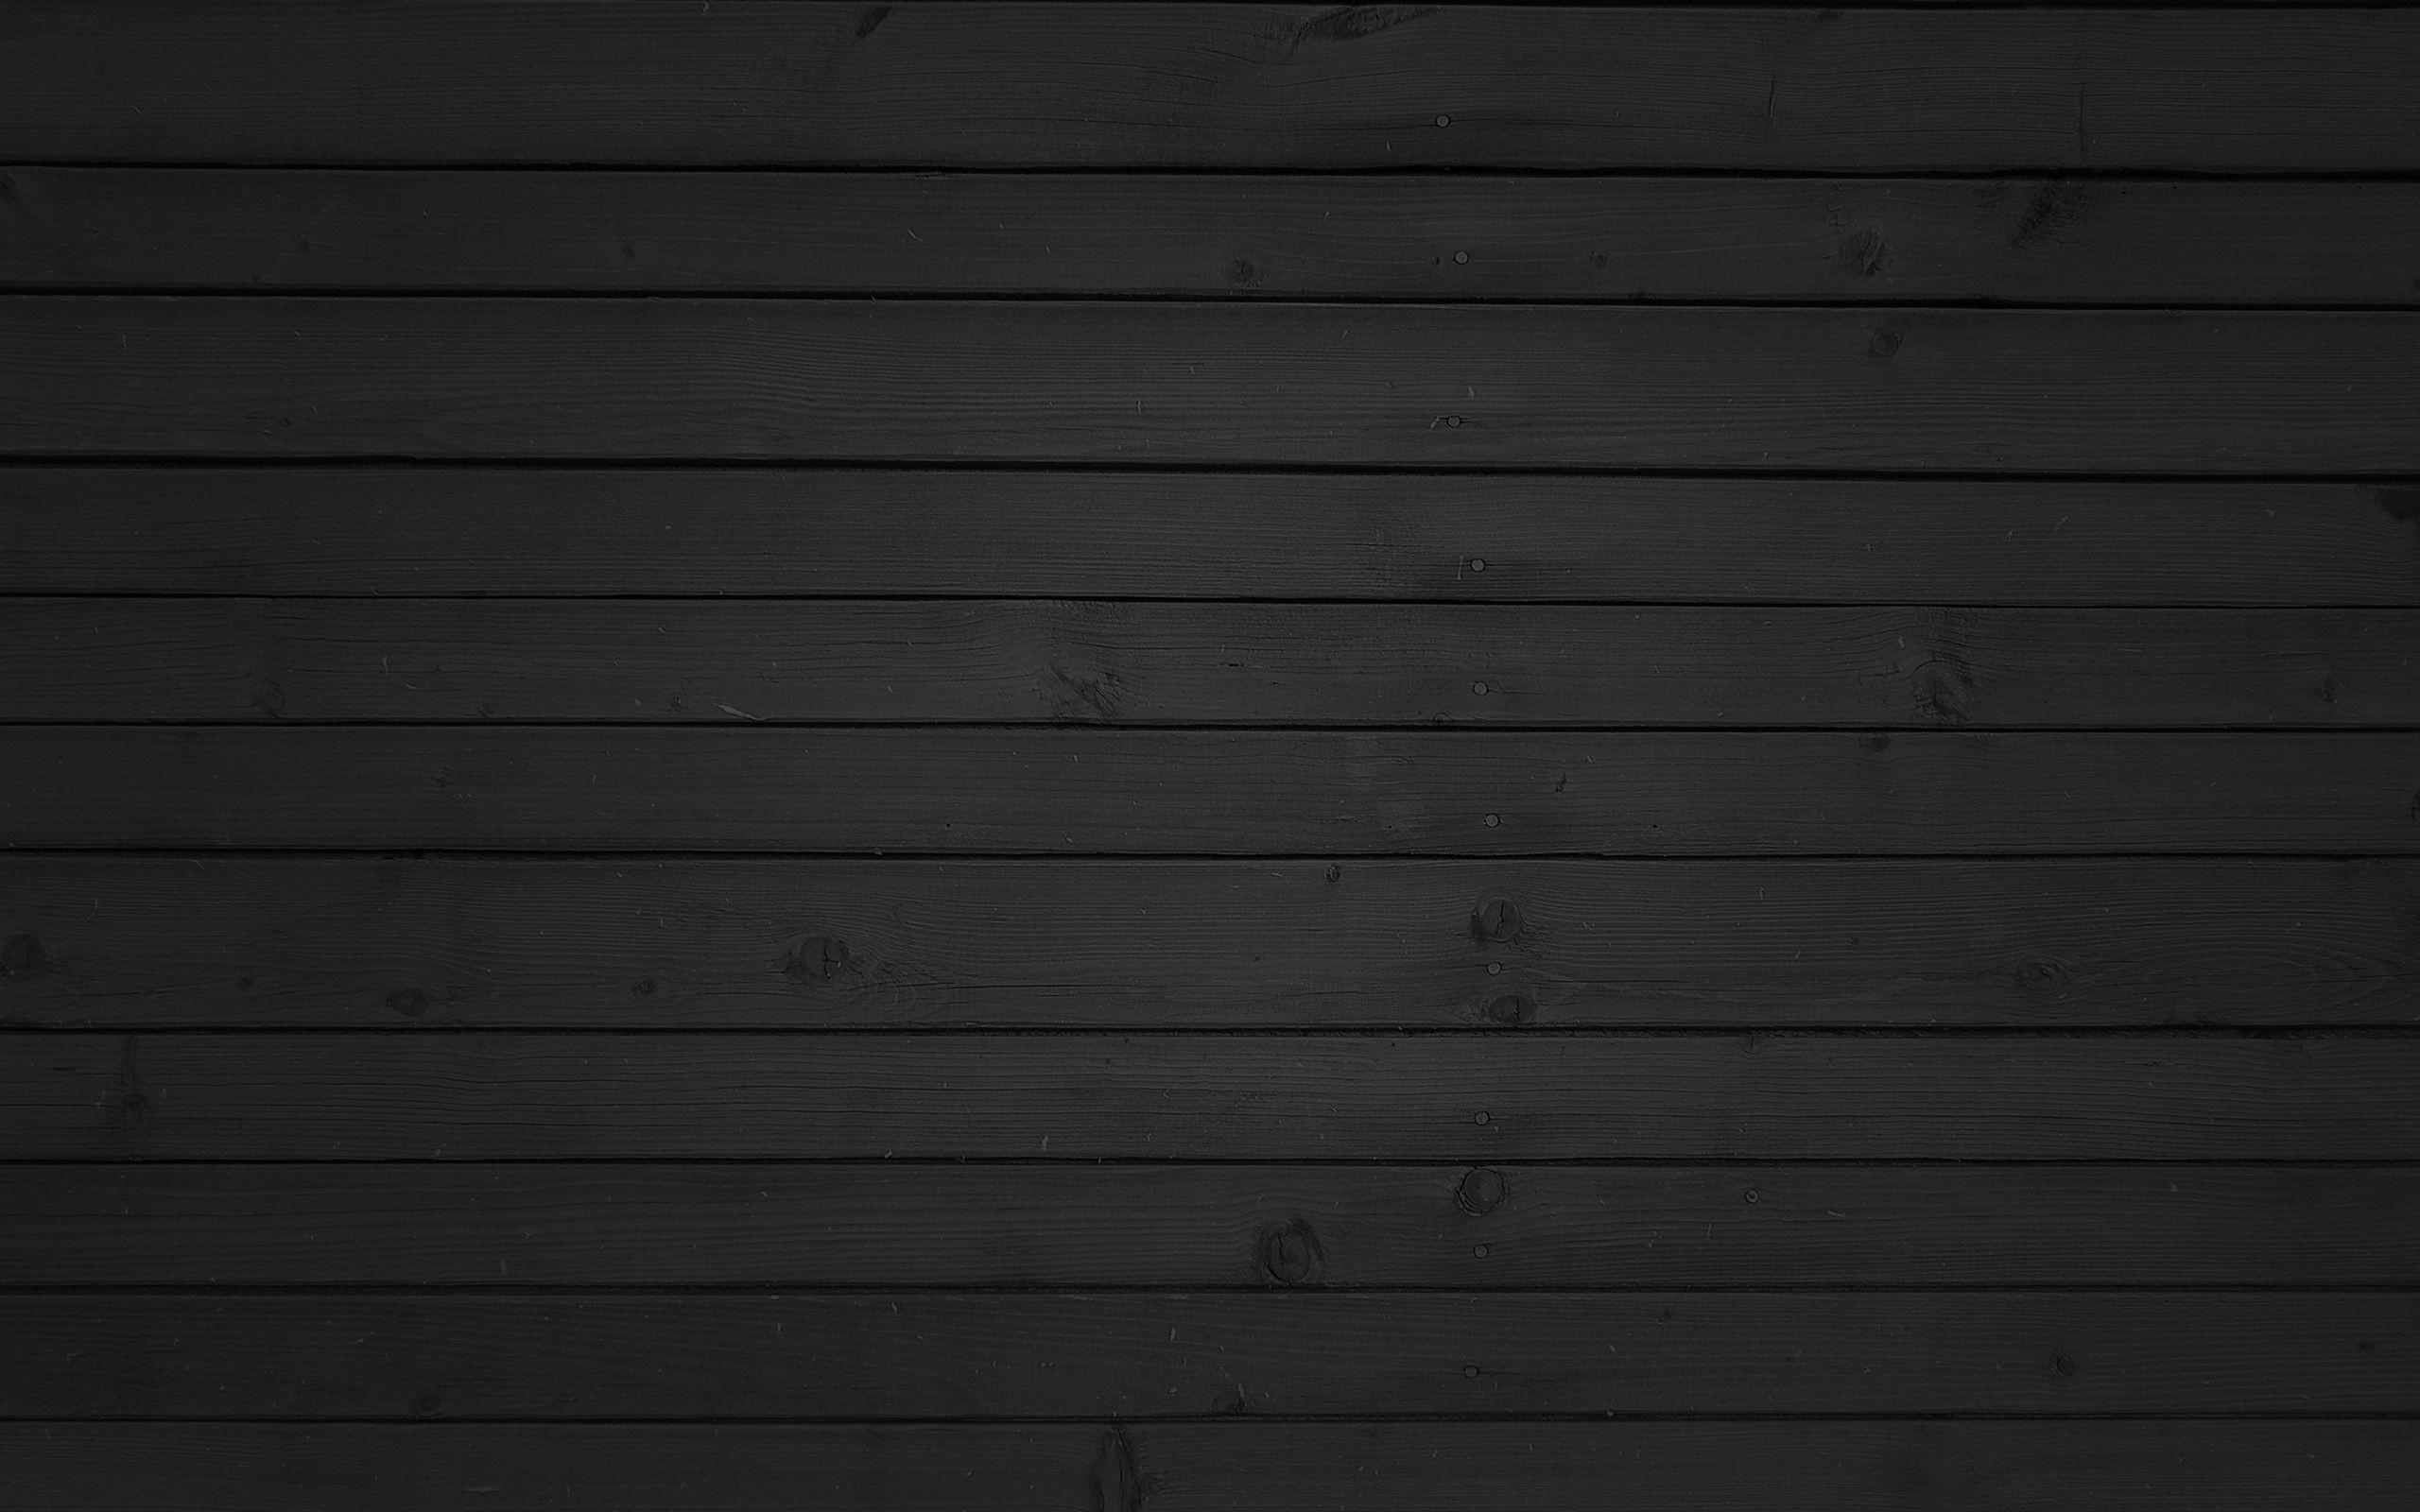 COOL BLACK BACKGROUND DESIGNS – NANOWALLPAPER